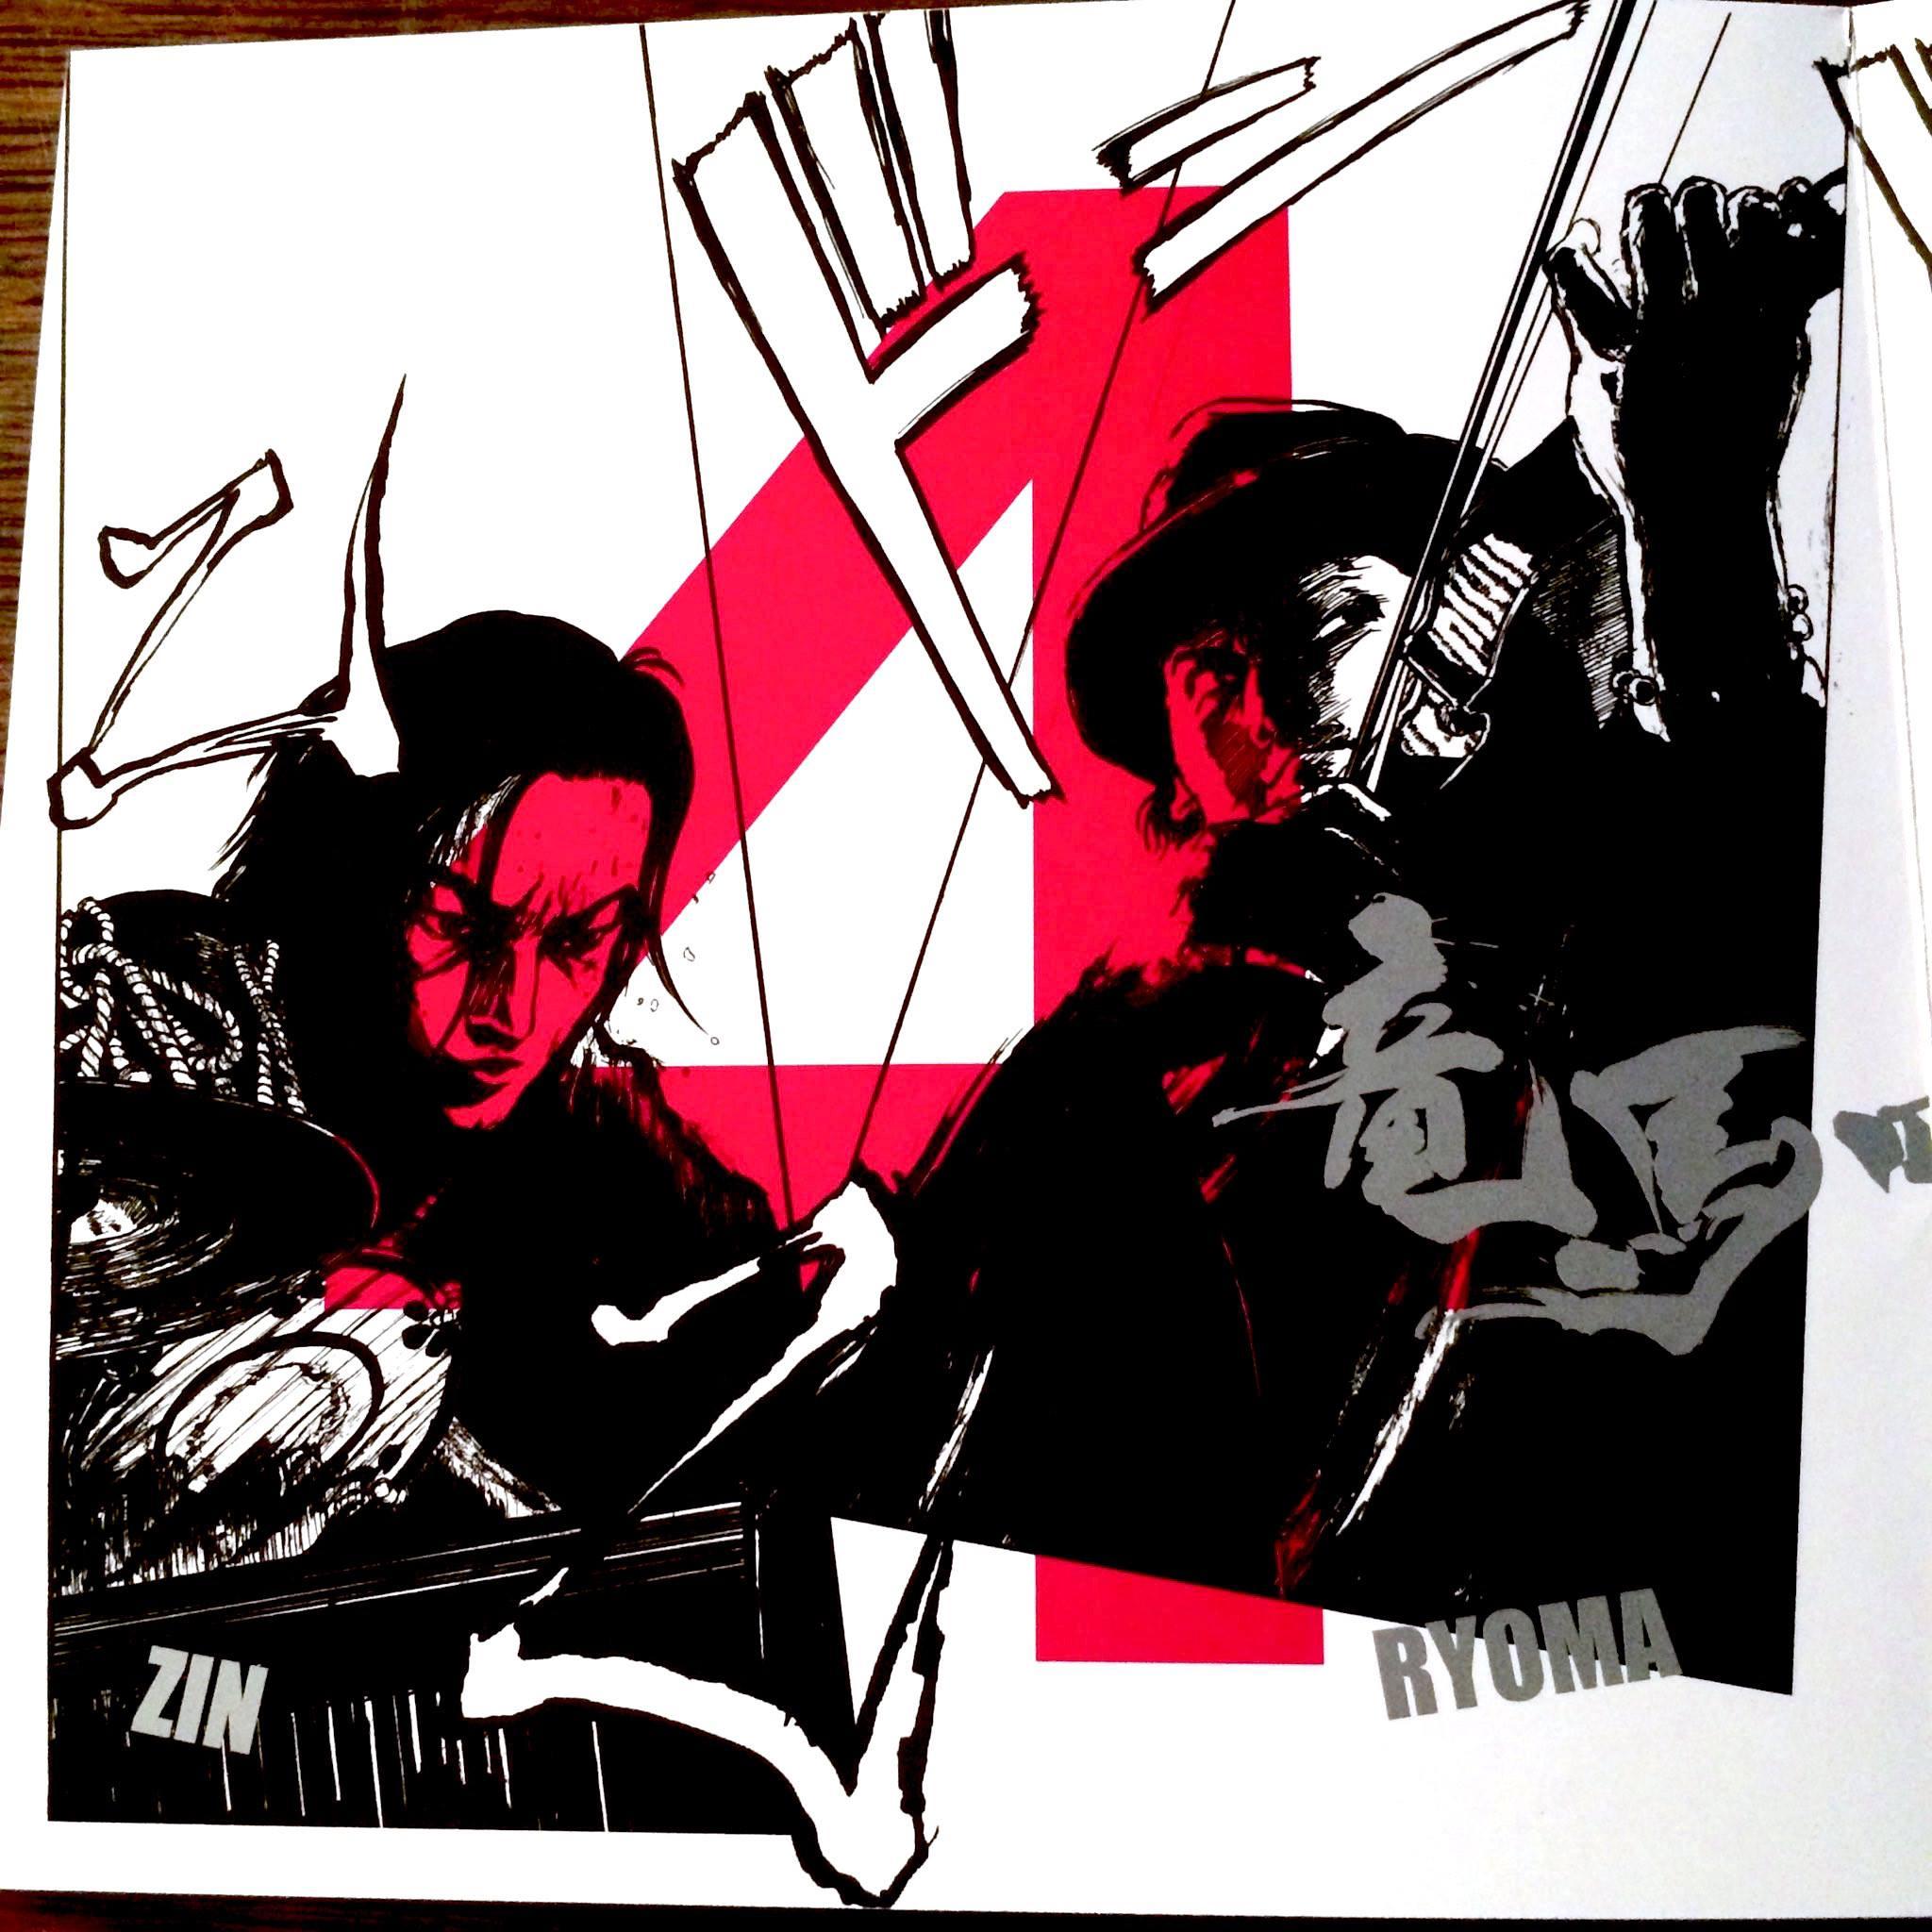 Ryoma Quartet _NEO ZIPANG_04